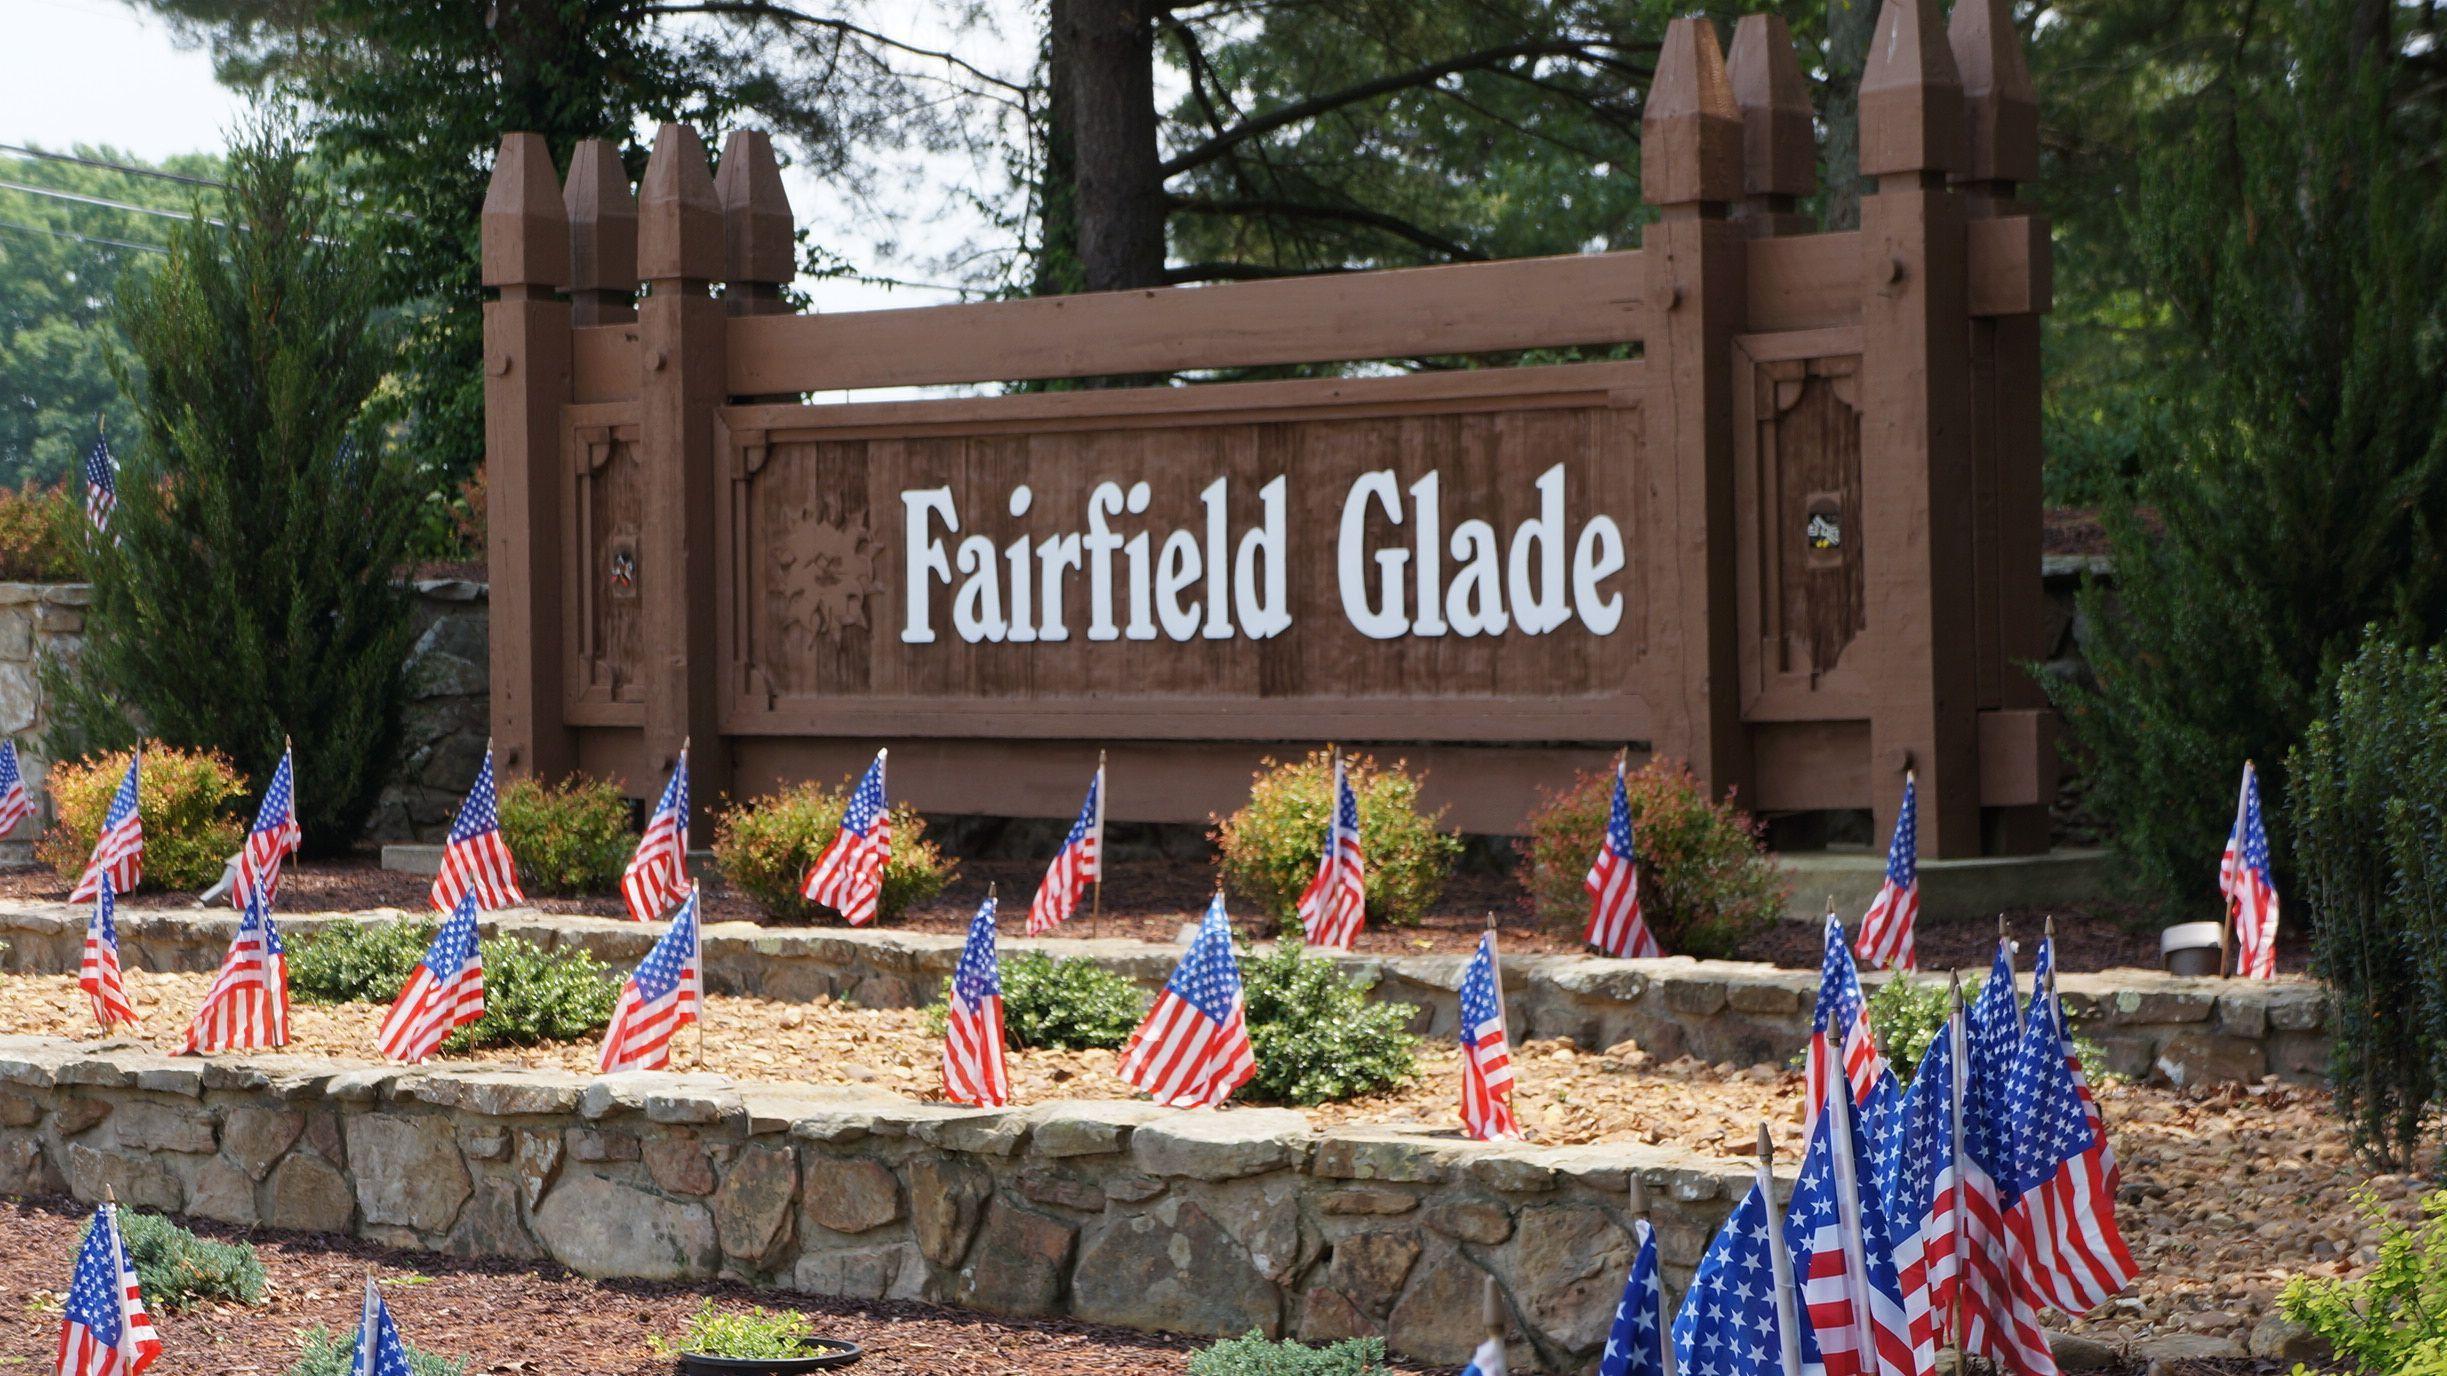 Fun Friends Of Fairfield Glade